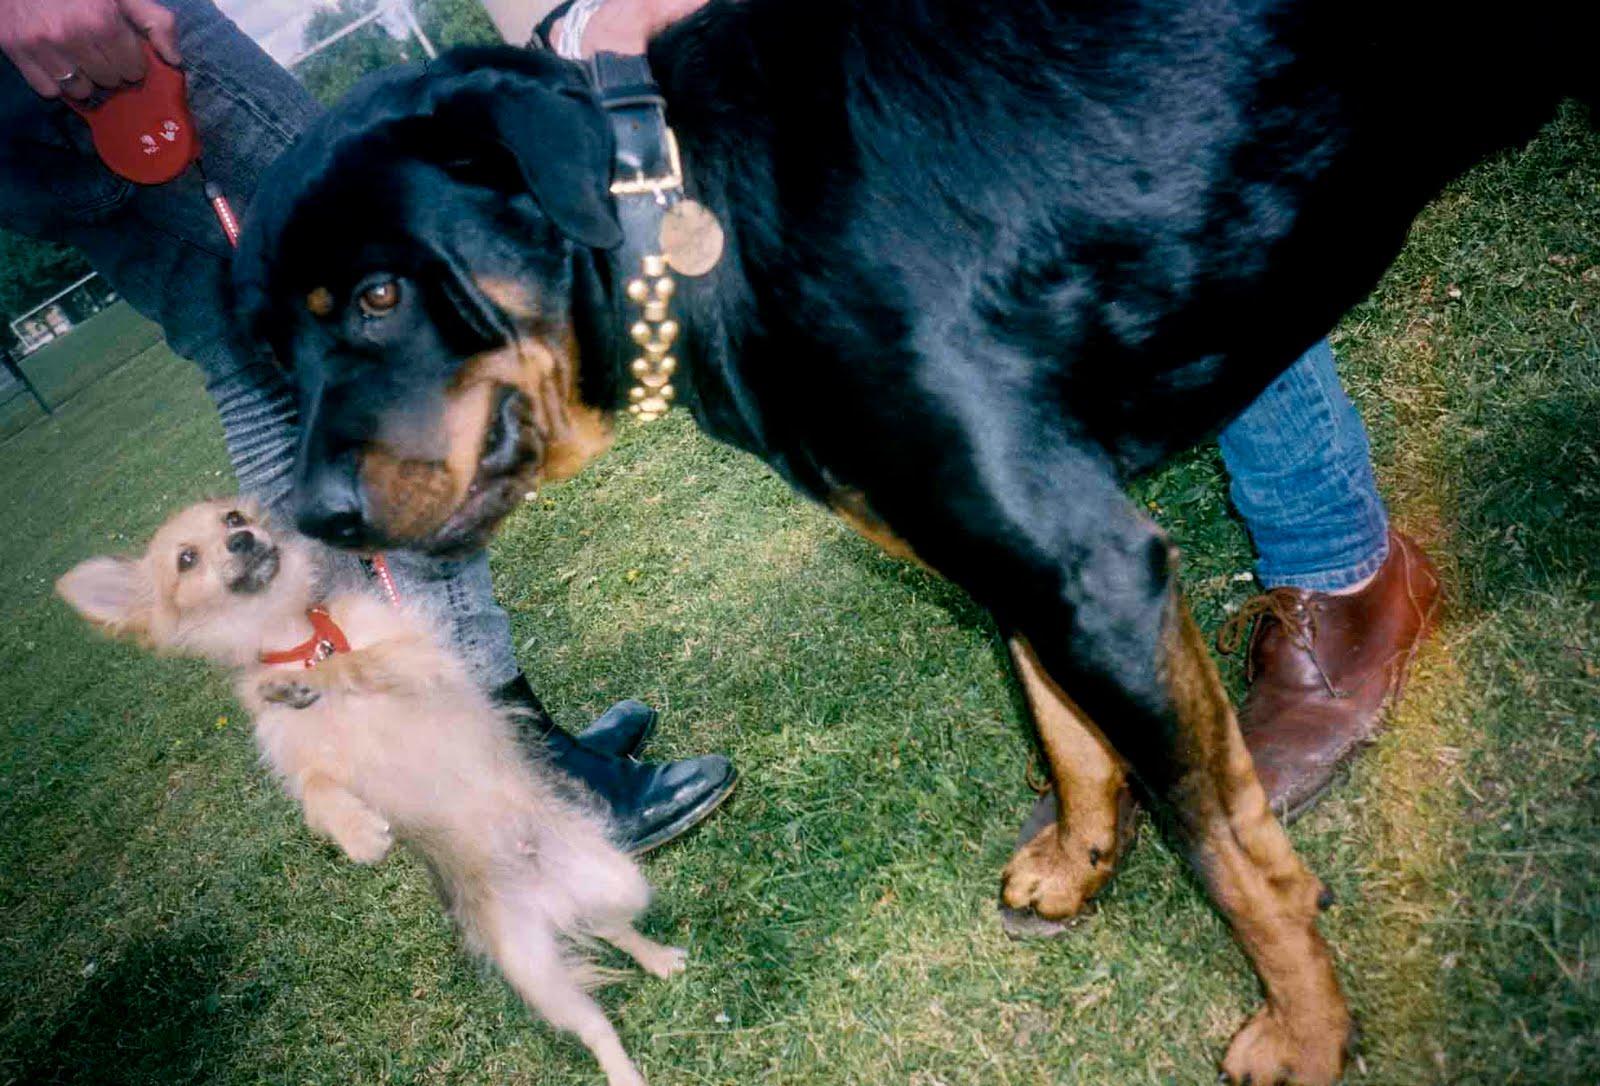 http://4.bp.blogspot.com/_eE3-8zKLl7Q/SxQjRH7BsaI/AAAAAAAAAaw/heV81i00-9I/s1600/dog+fight.jpg